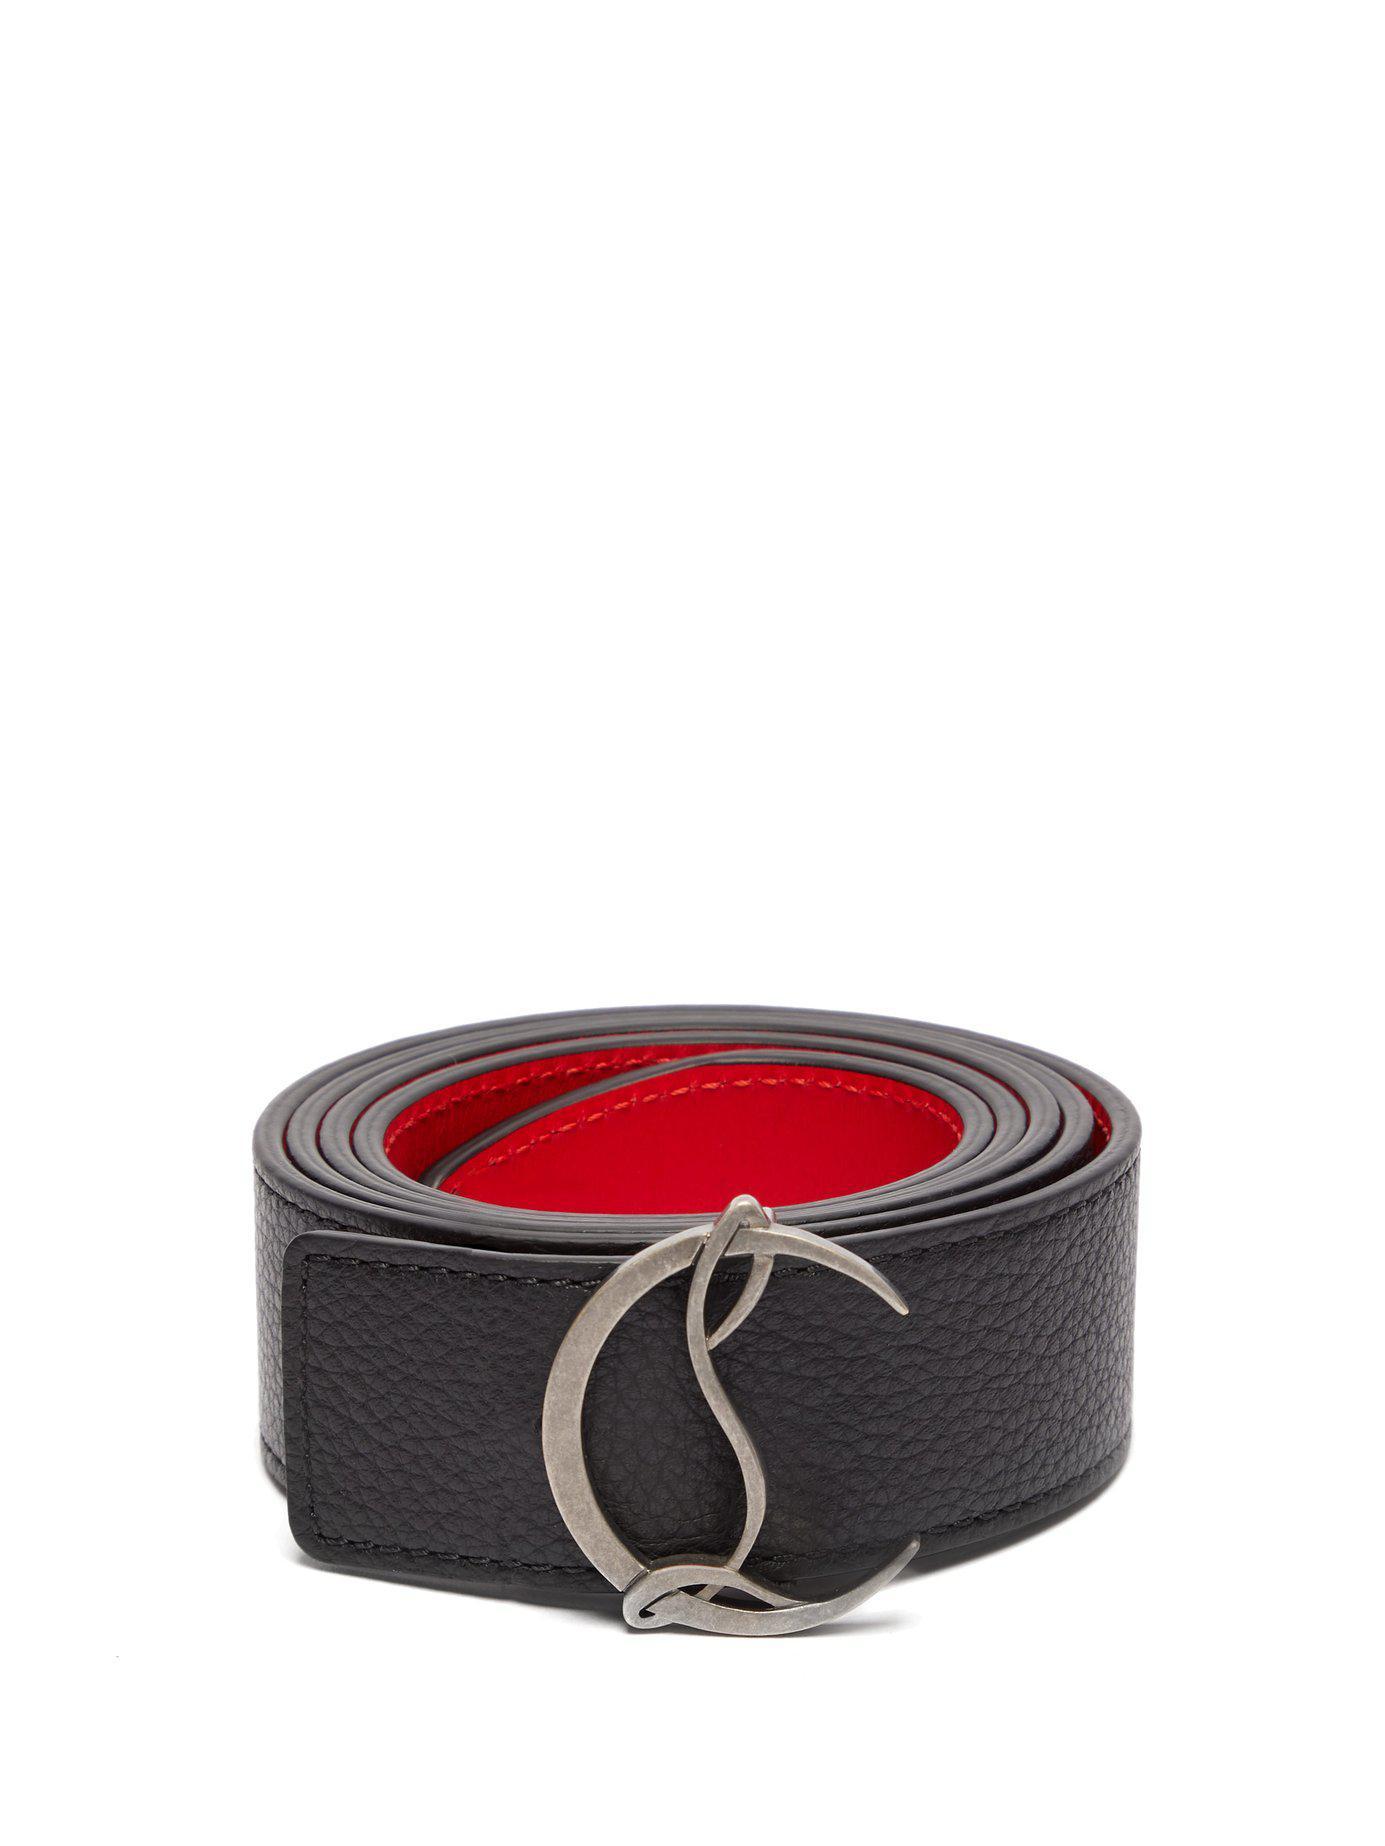 4638bc6ca7e8 Lyst - Christian Louboutin Logo Leather Belt in Black for Men